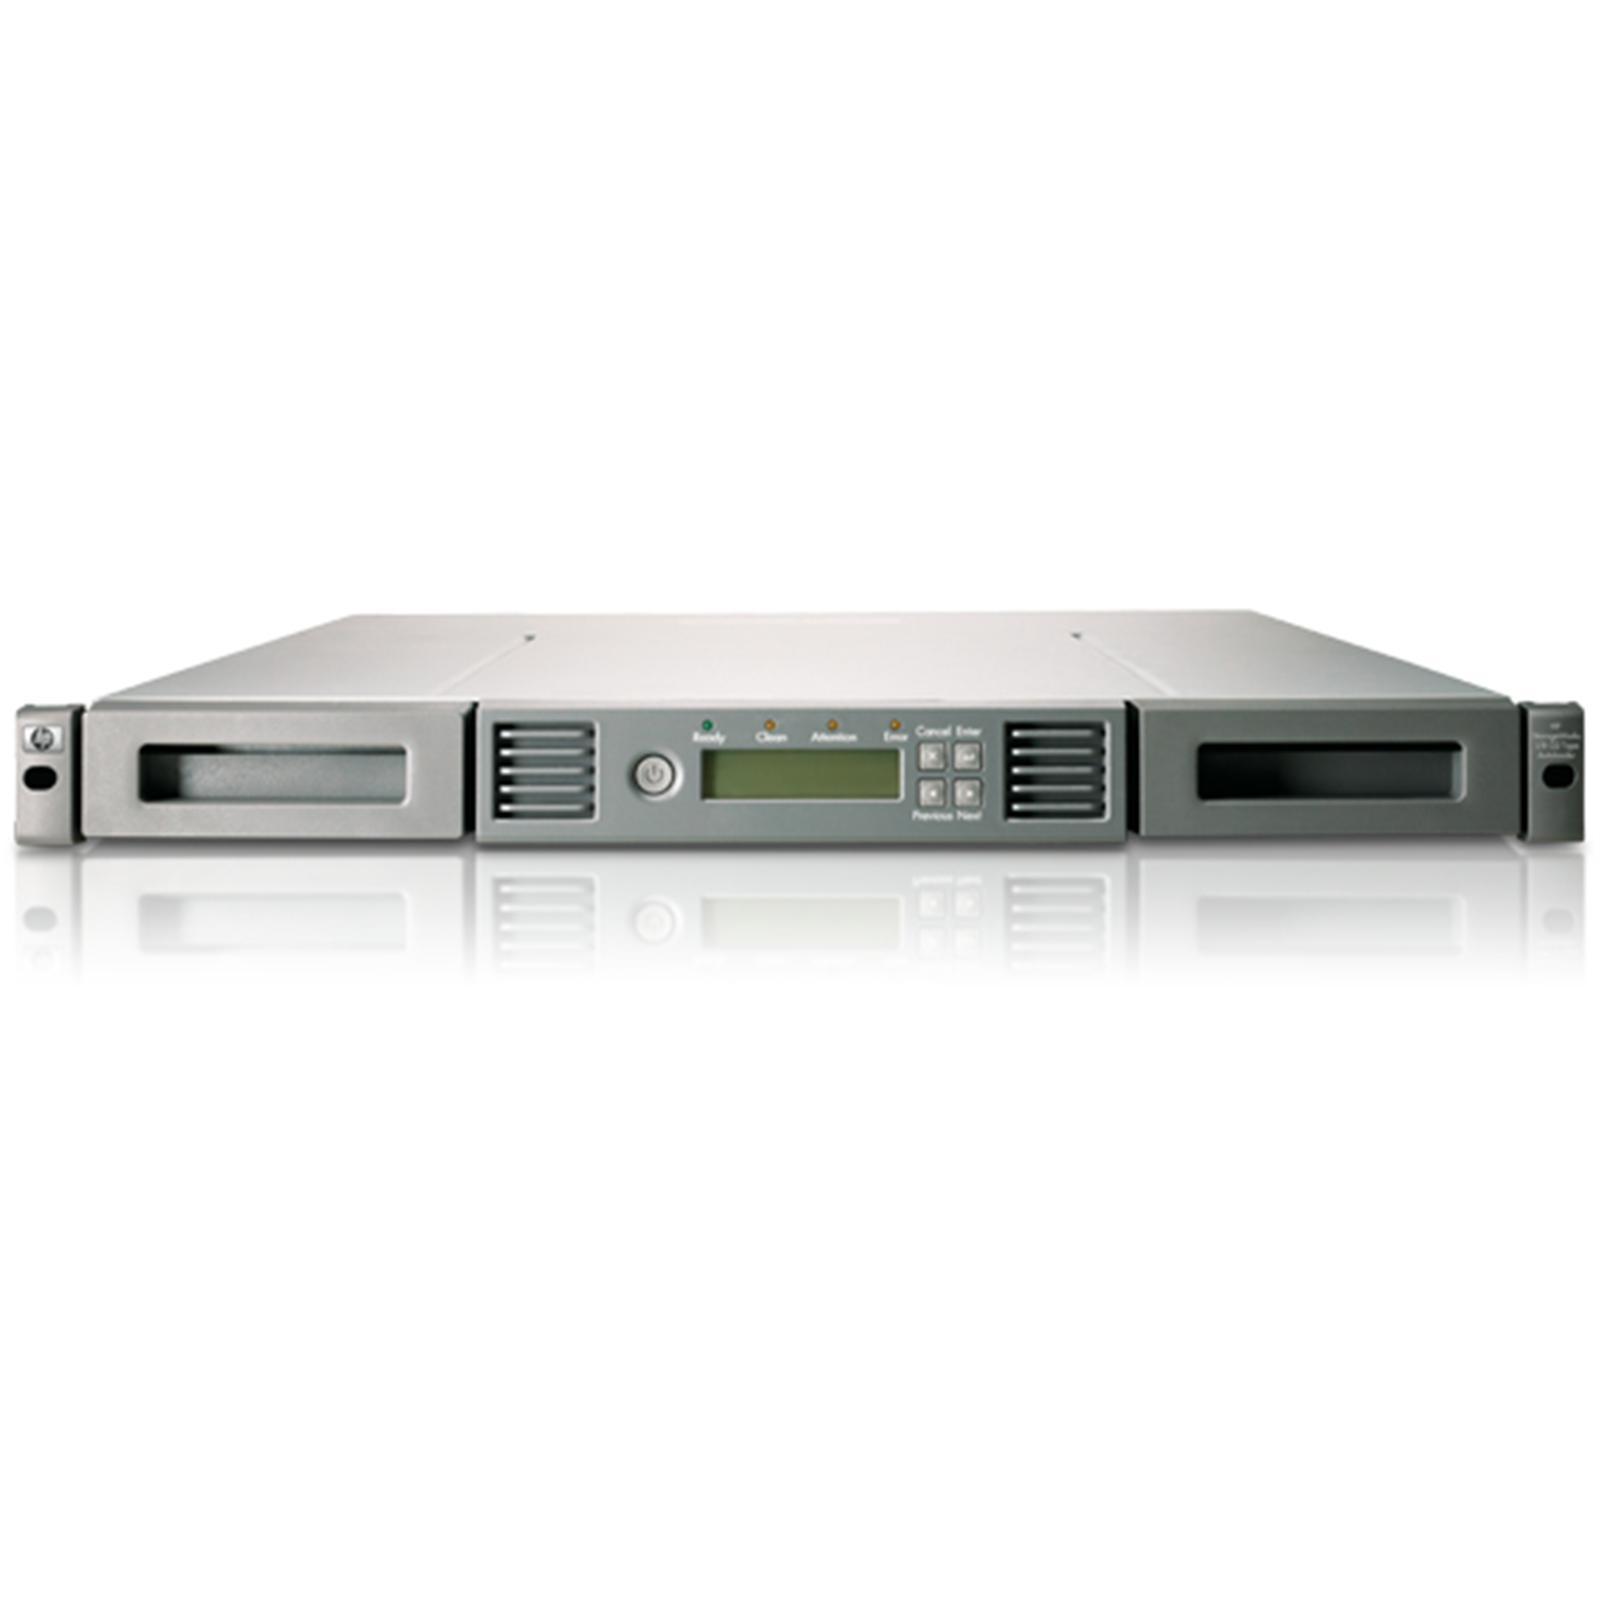 HP 1/8 G2 LTO-5 3000 FC Autoloader